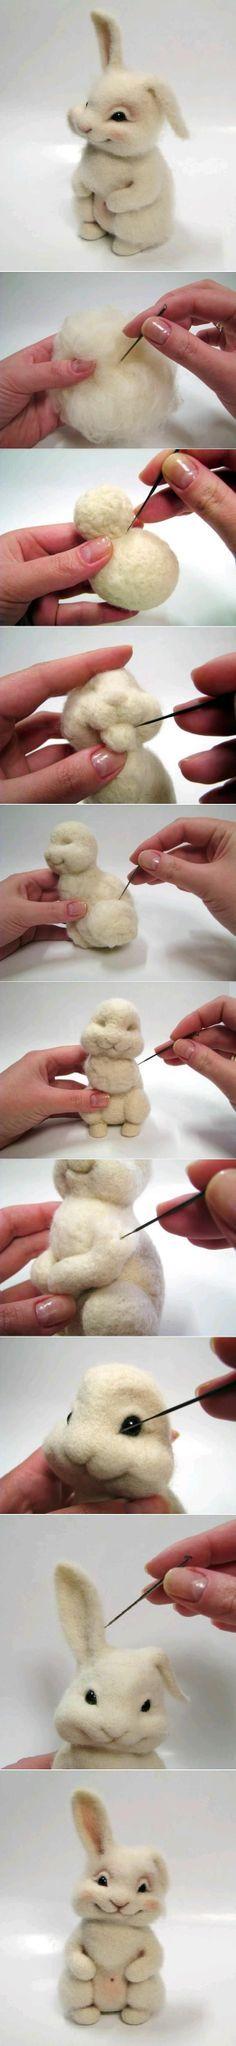 Rabbit doll so cute!